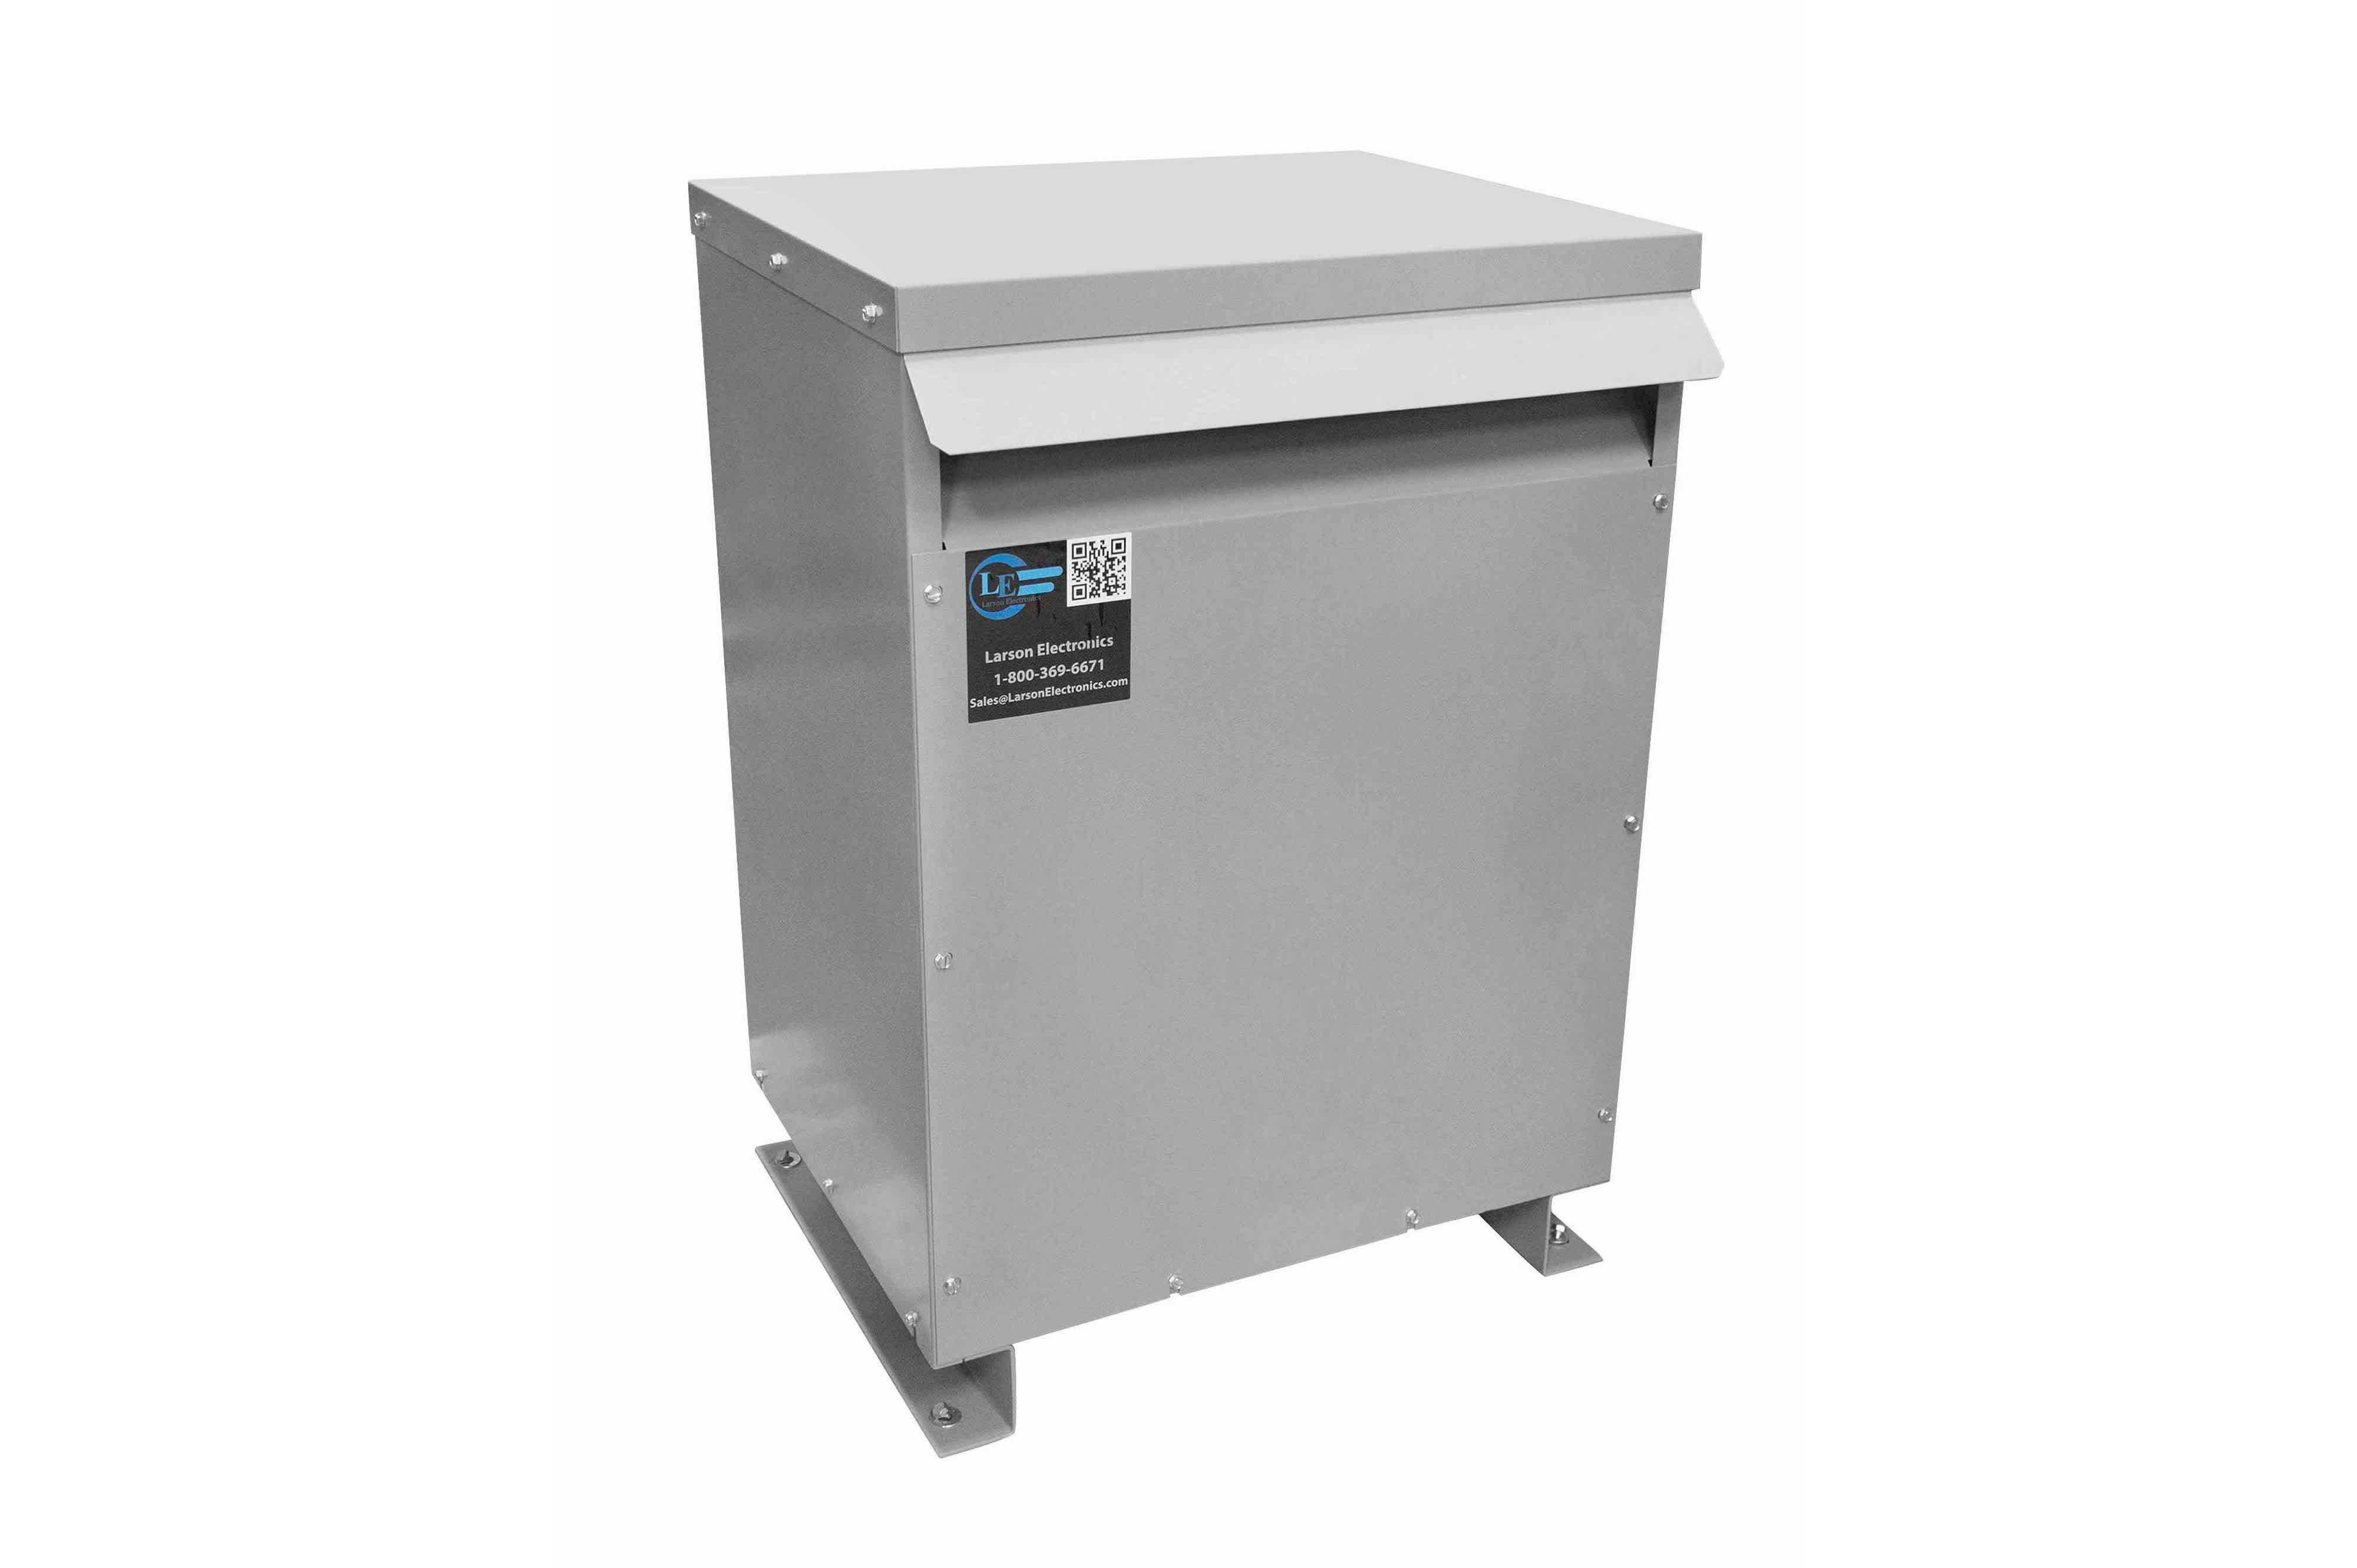 40 kVA 3PH Isolation Transformer, 575V Wye Primary, 380Y/220 Wye-N Secondary, N3R, Ventilated, 60 Hz